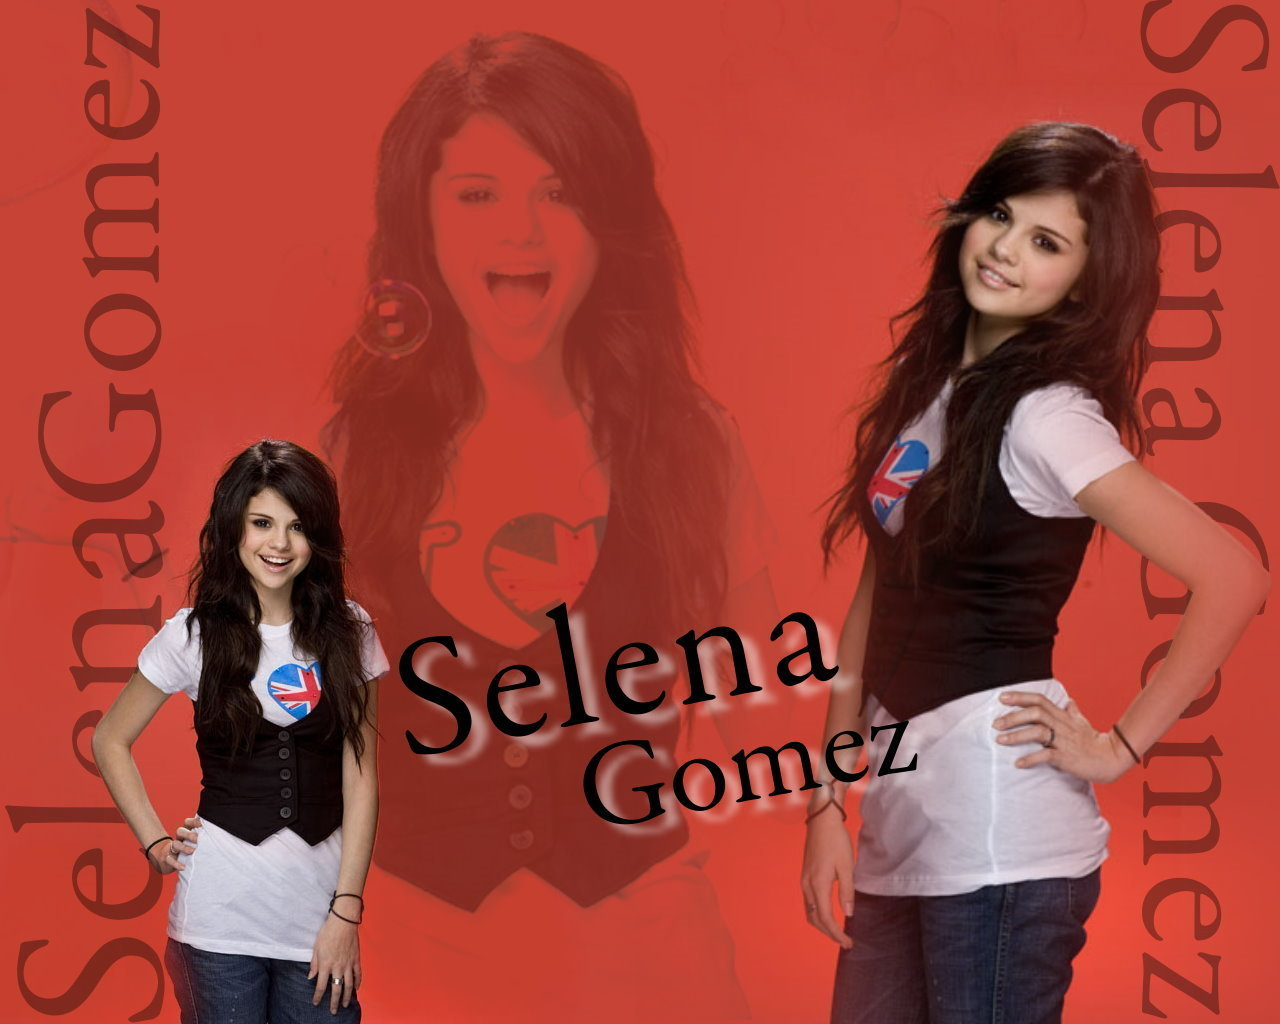 Selena Gomez Wallpaper   Selena Gomez Wallpaper 6591567 1280x1024